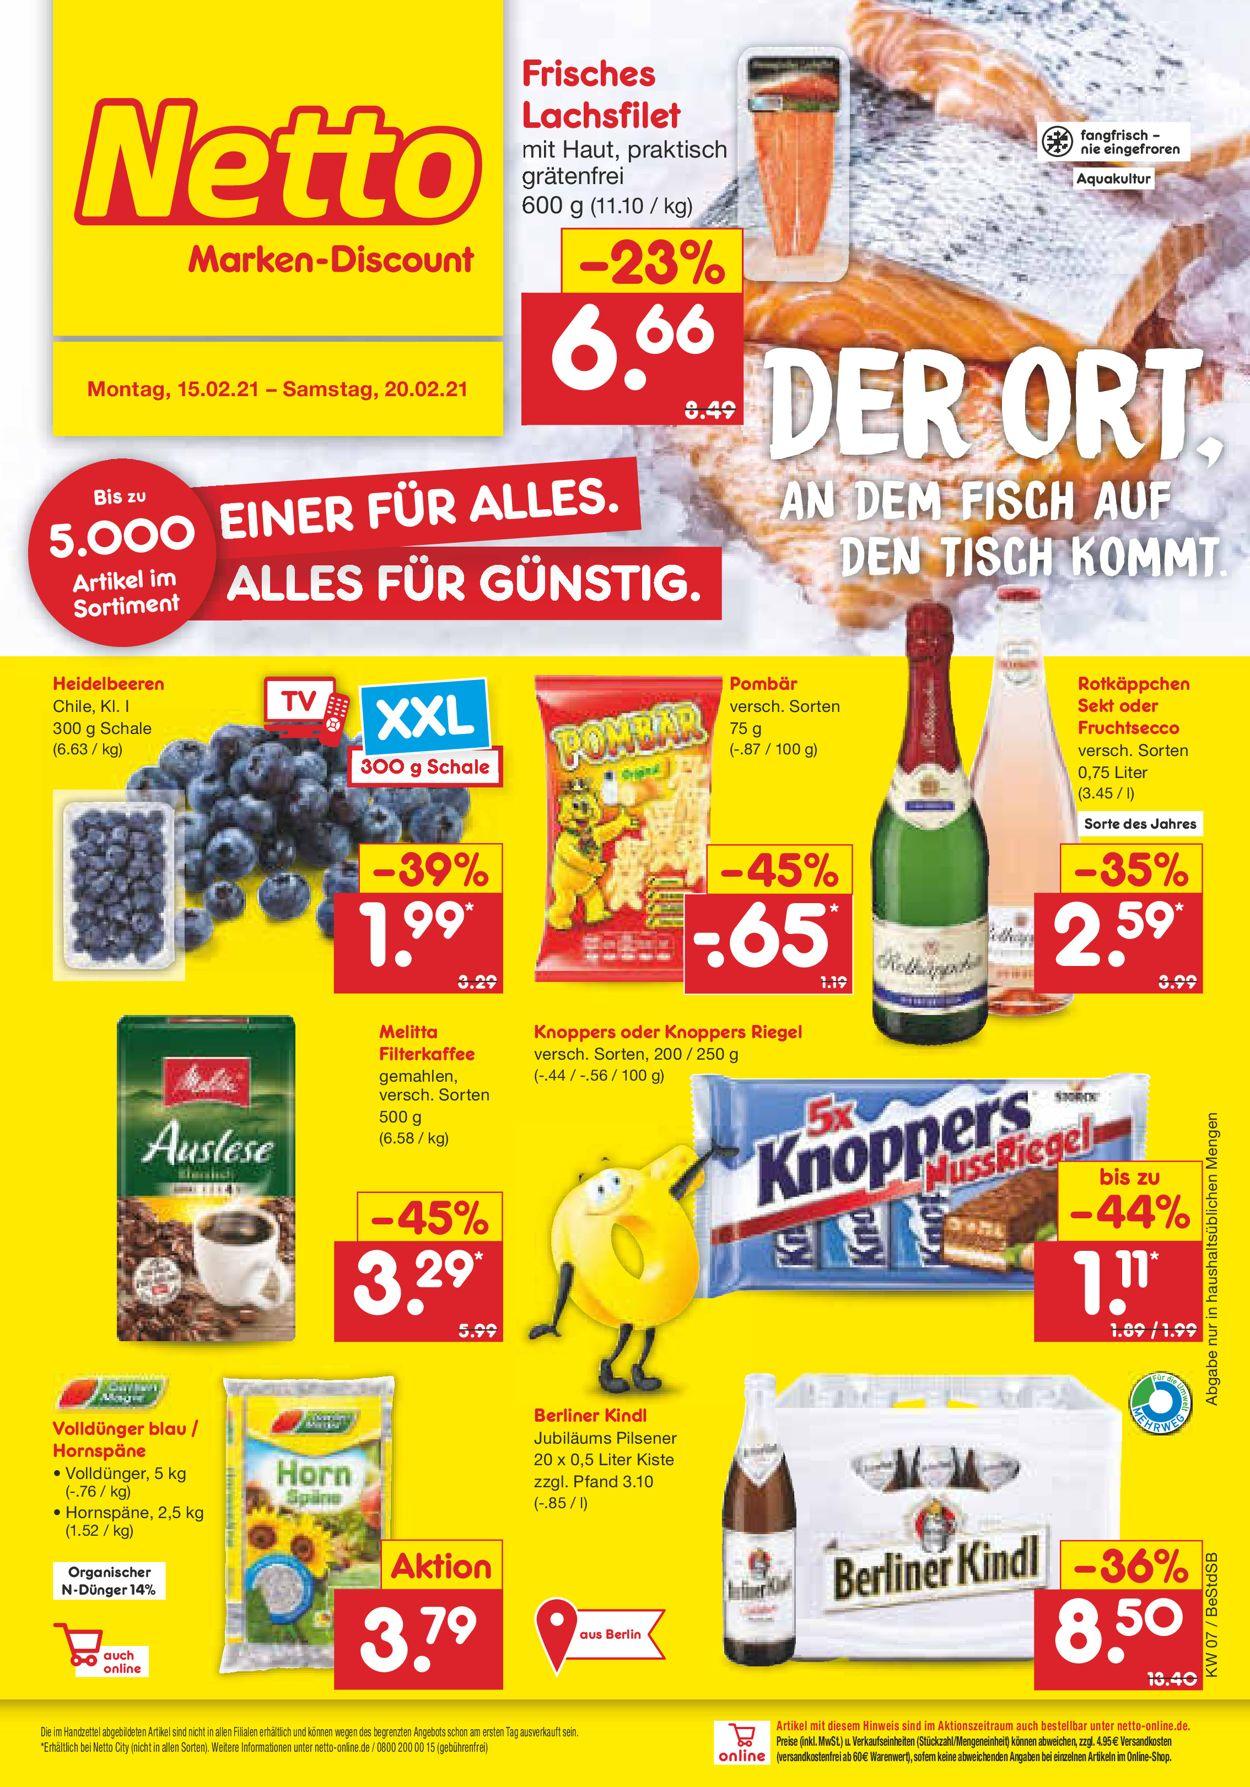 Netto Marken Discount Aktueller Prospekt 20.20   20.20.2201 ...